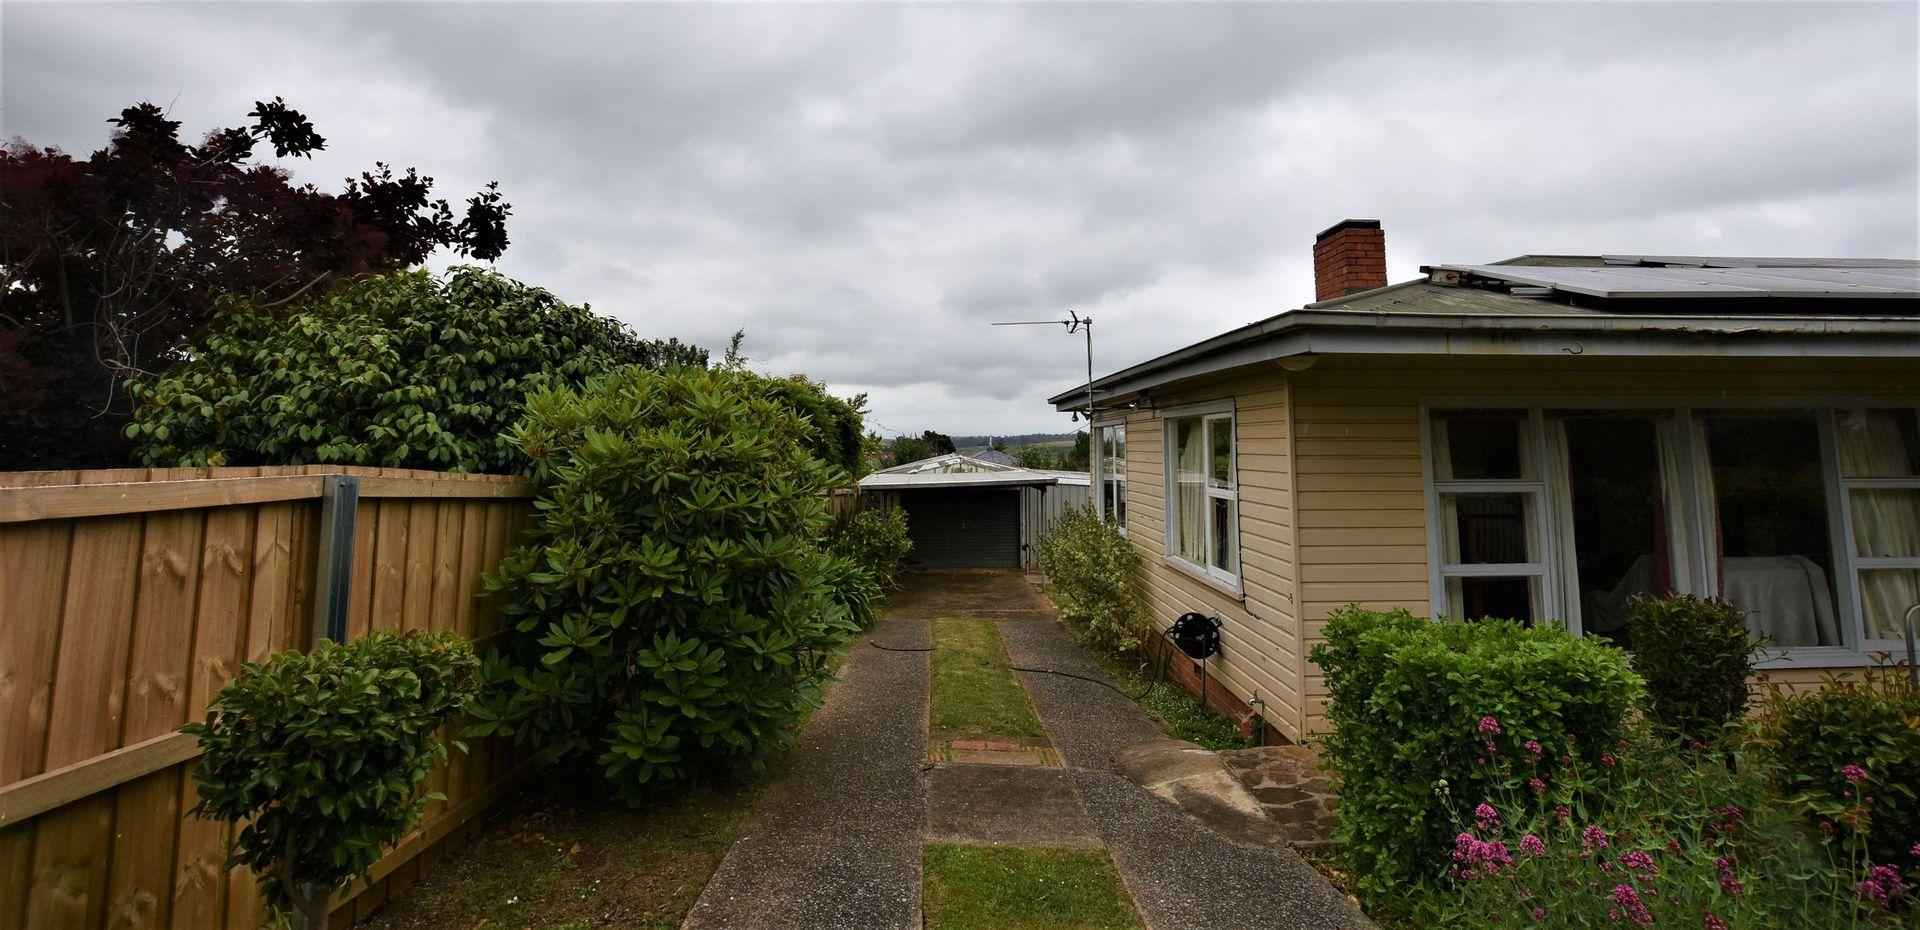 46 Weston St, Deloraine TAS 7304, Image 1